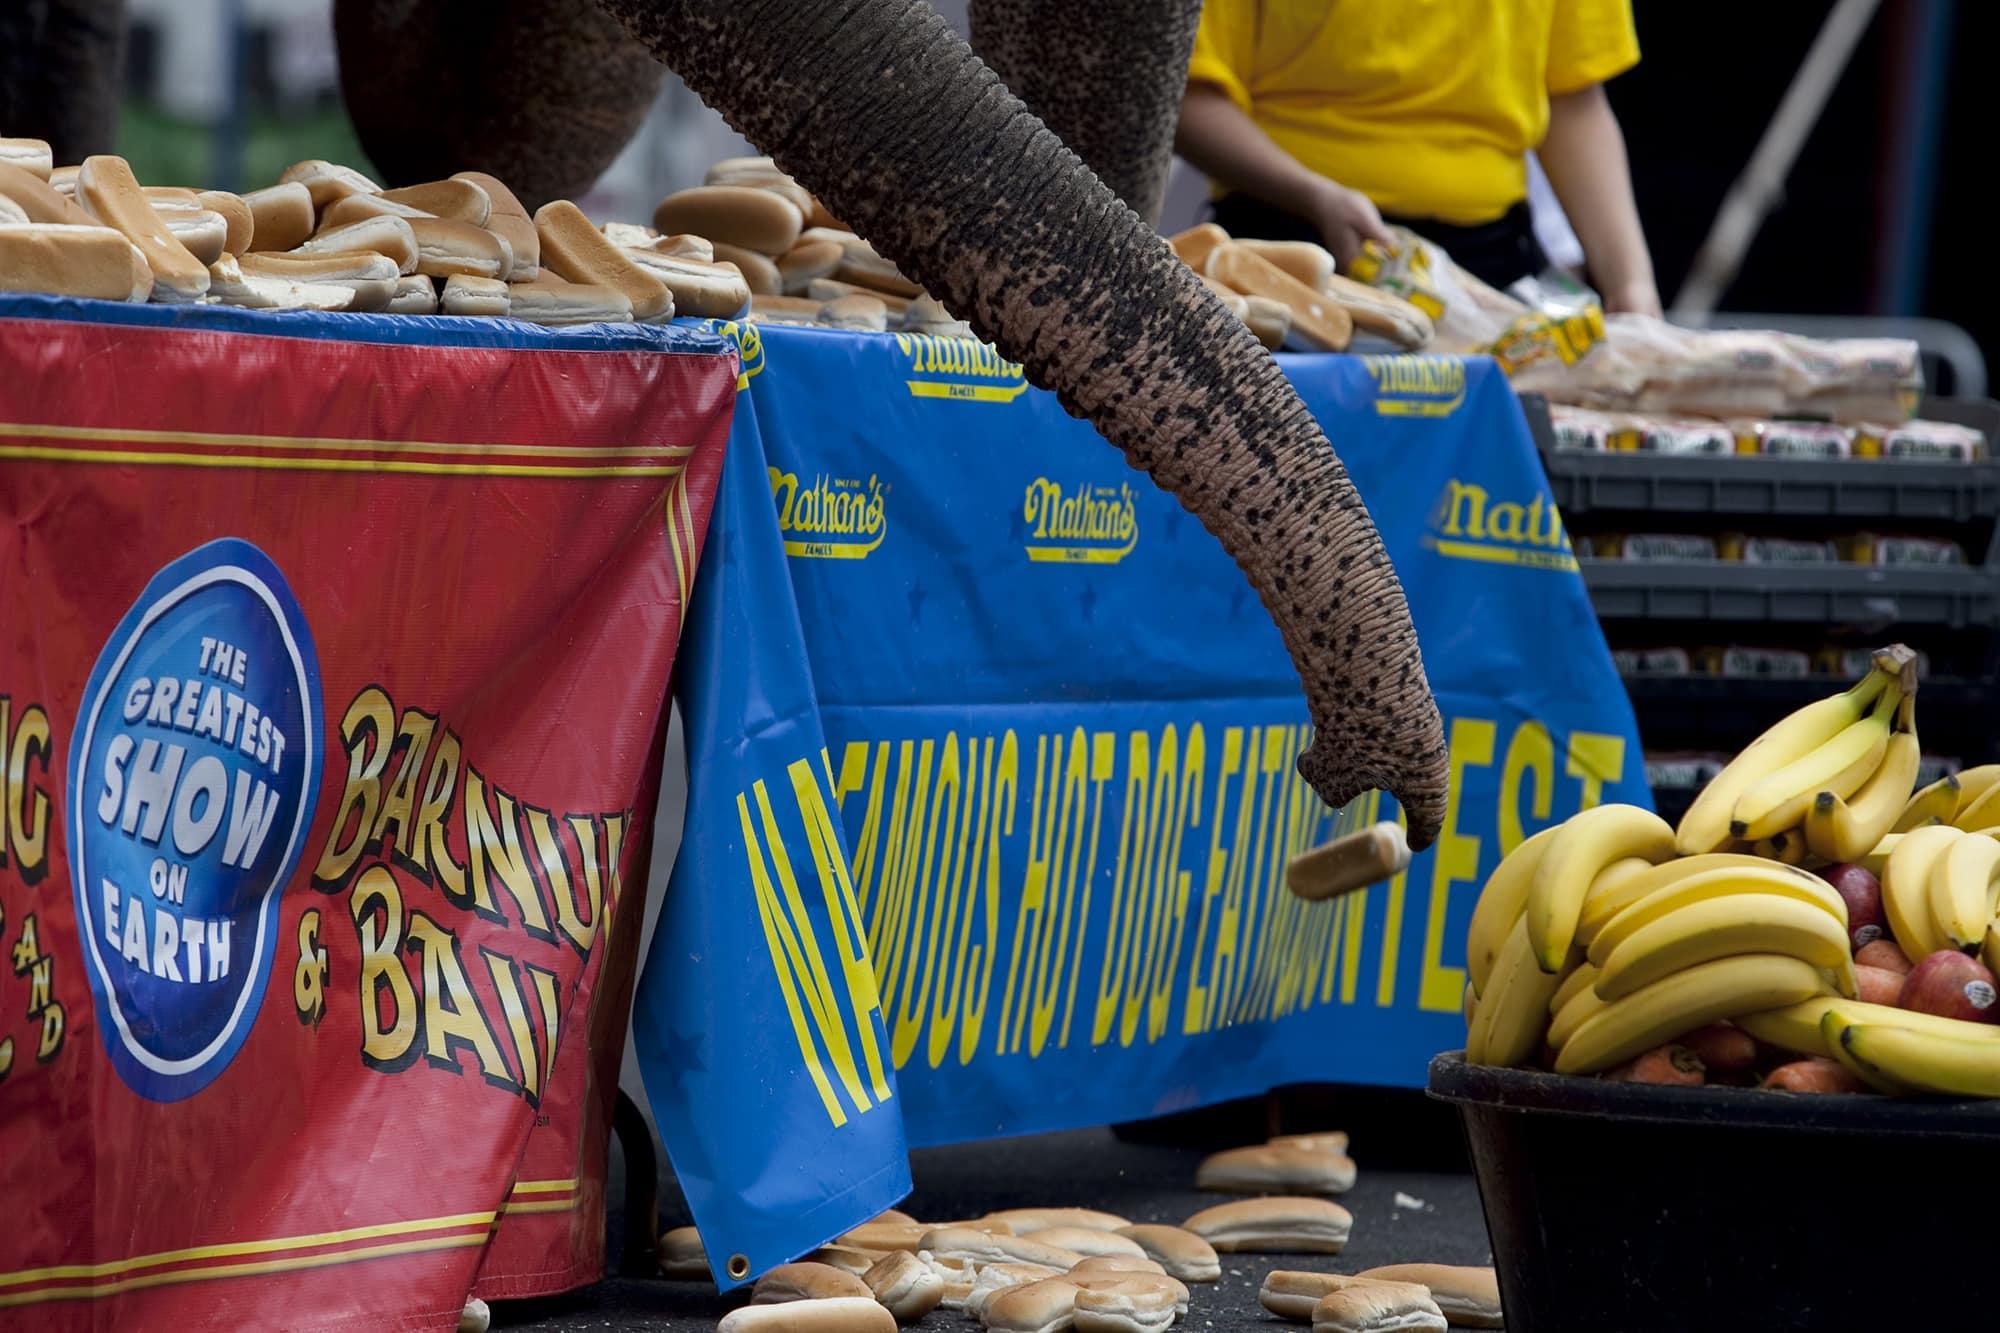 Human versus elephant eating contest on Coney Island